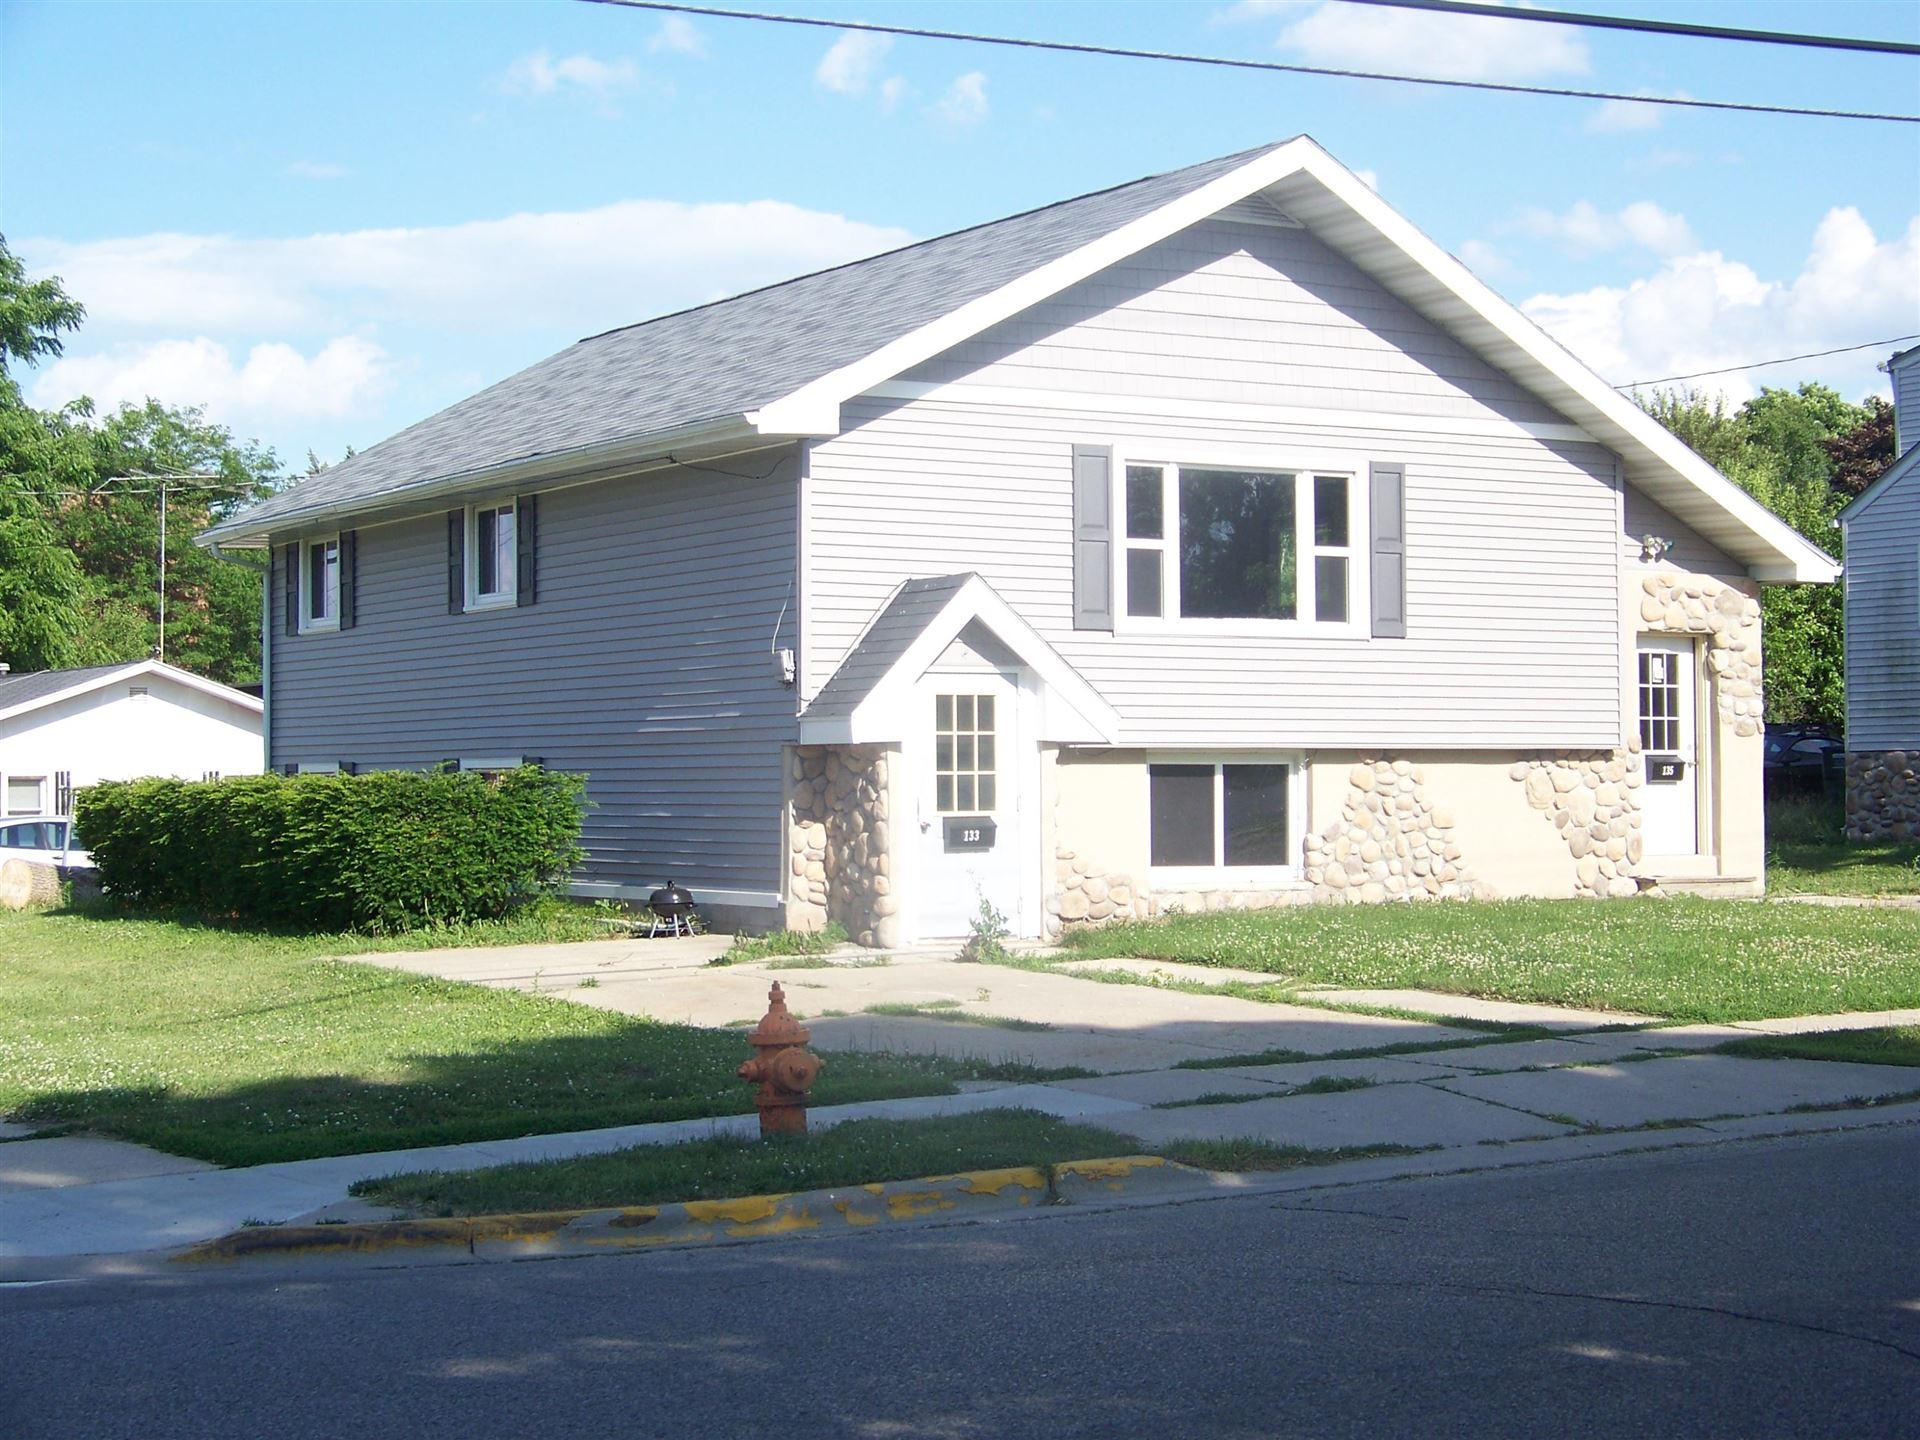 133 S Elizabeth St #135, Whitewater, WI 53190 - #: 1679712